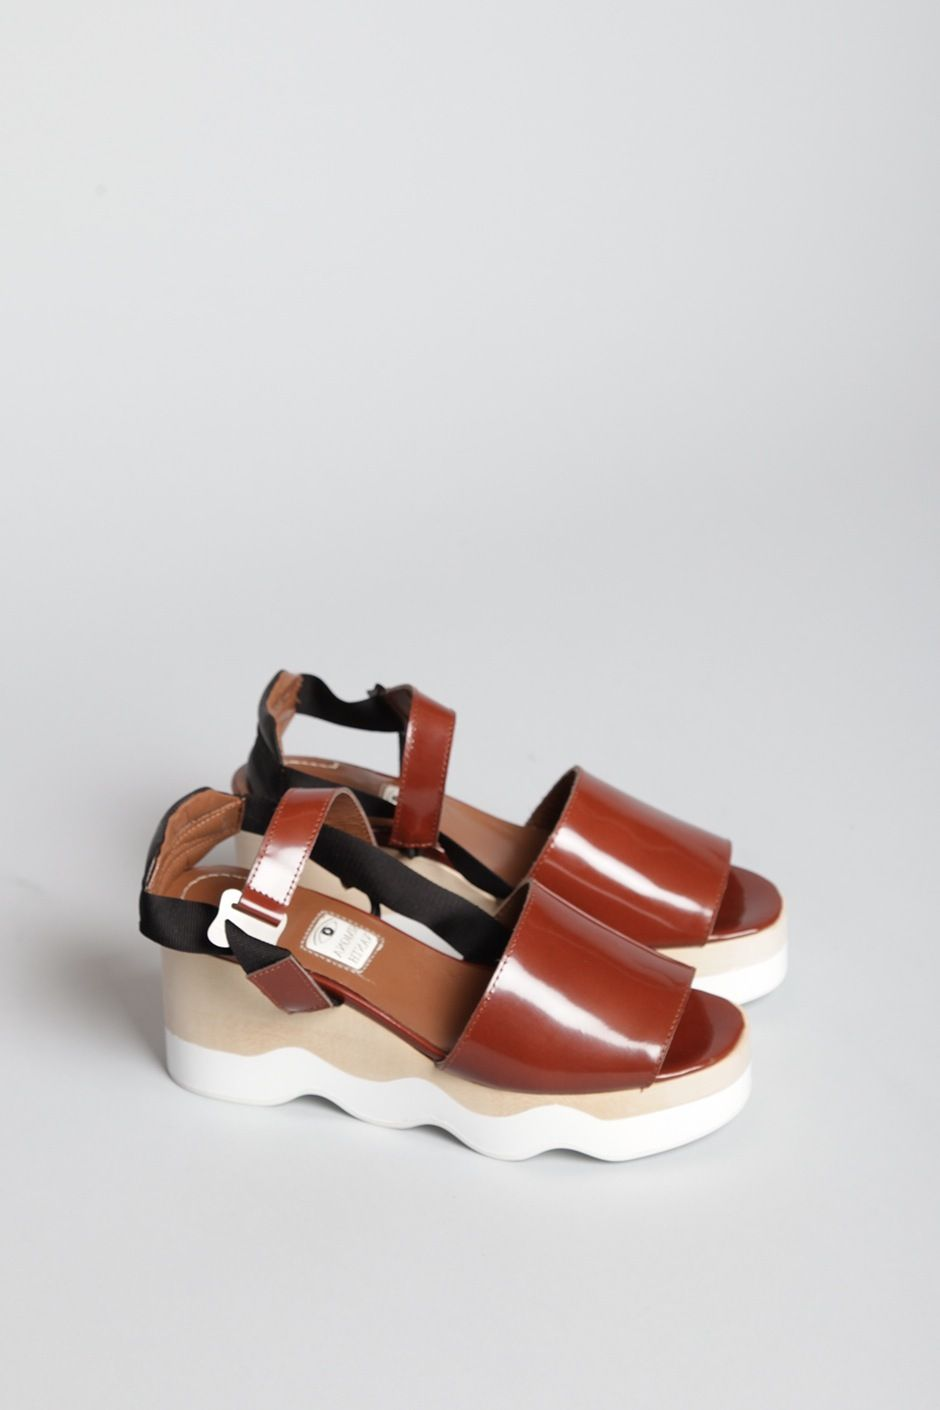 Simona Vanth Evan Cuoio Shoes Sock Shoes Me Too Shoes